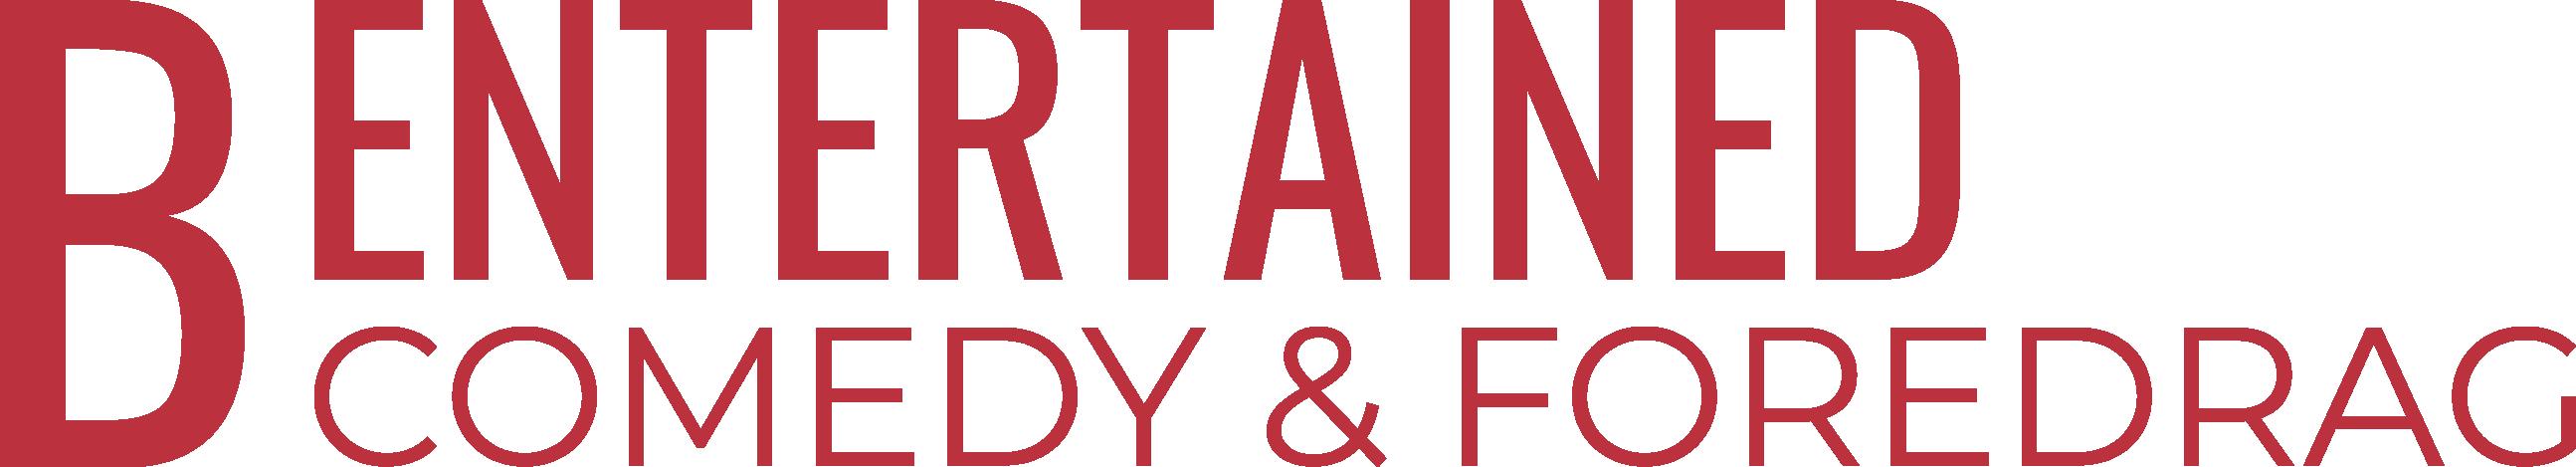 Bentertained Logo